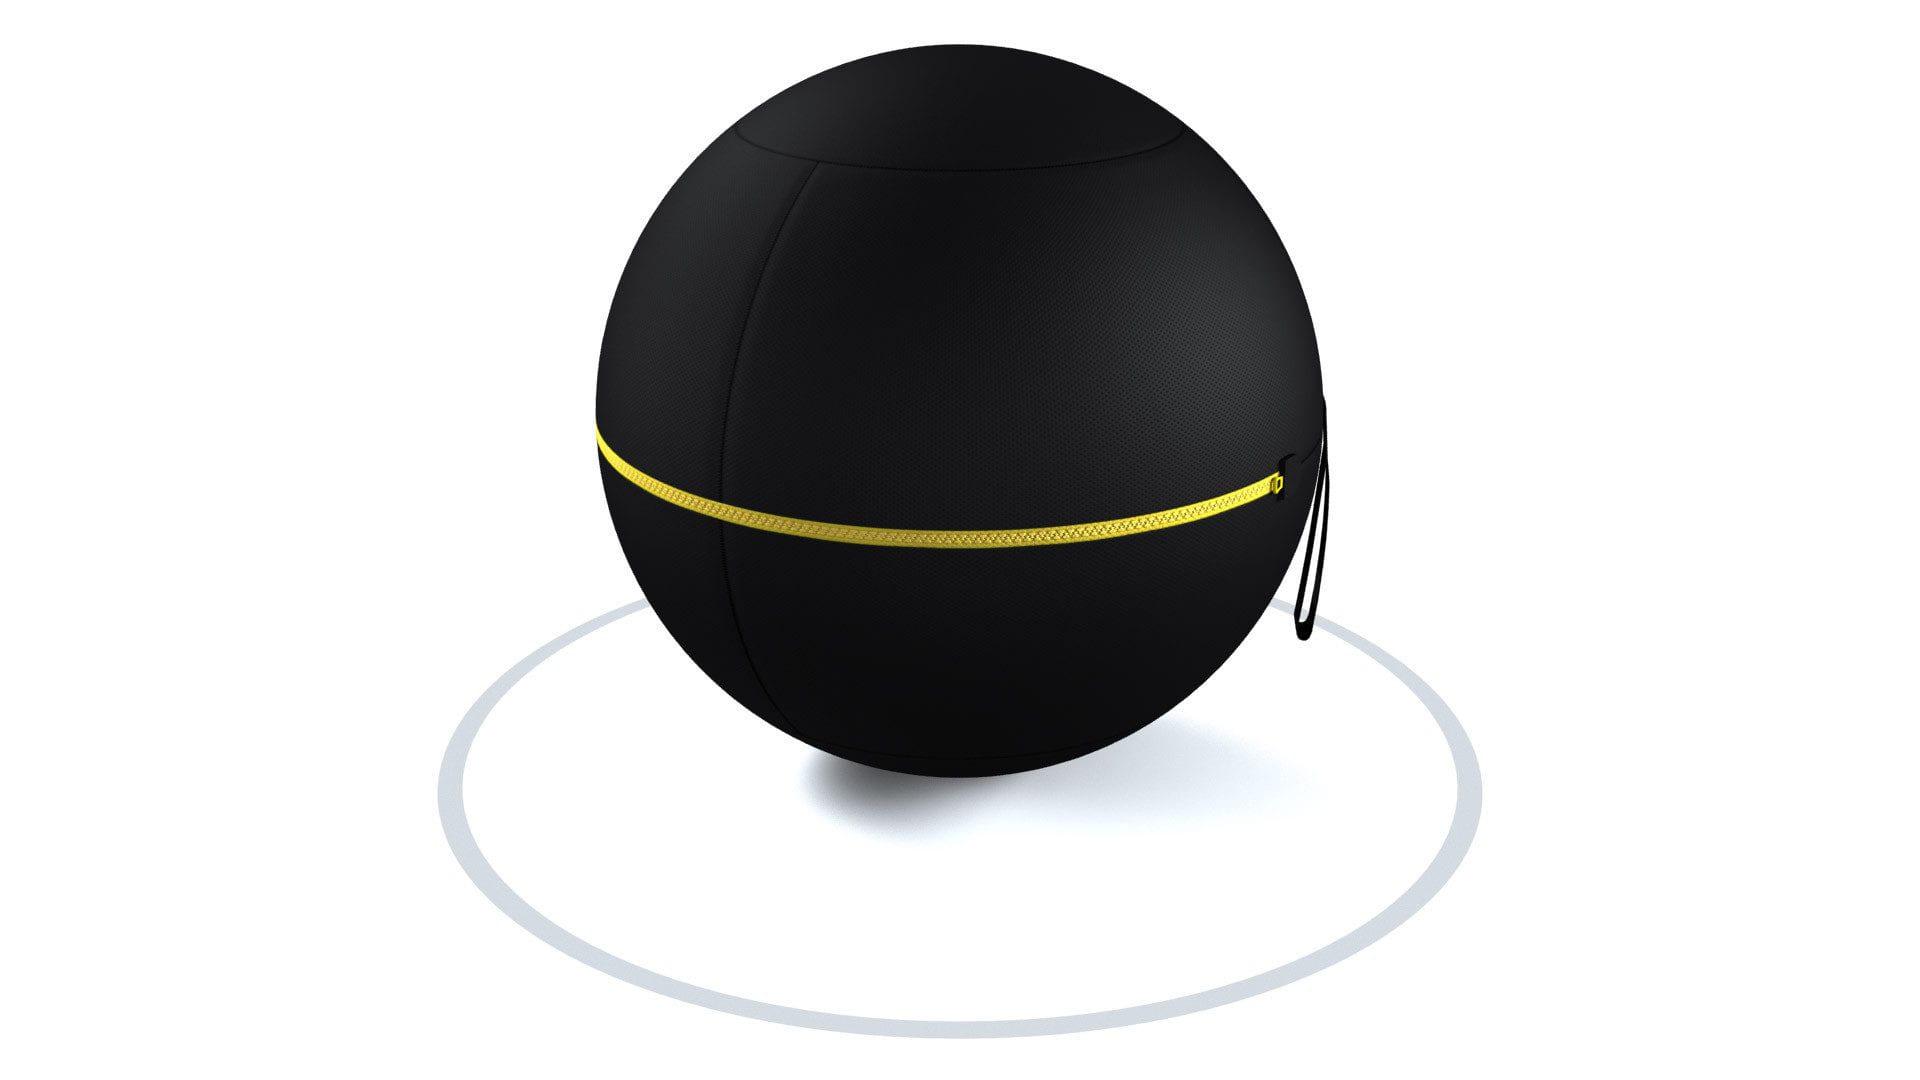 Technogym Wellness Ball™ Active Sitting